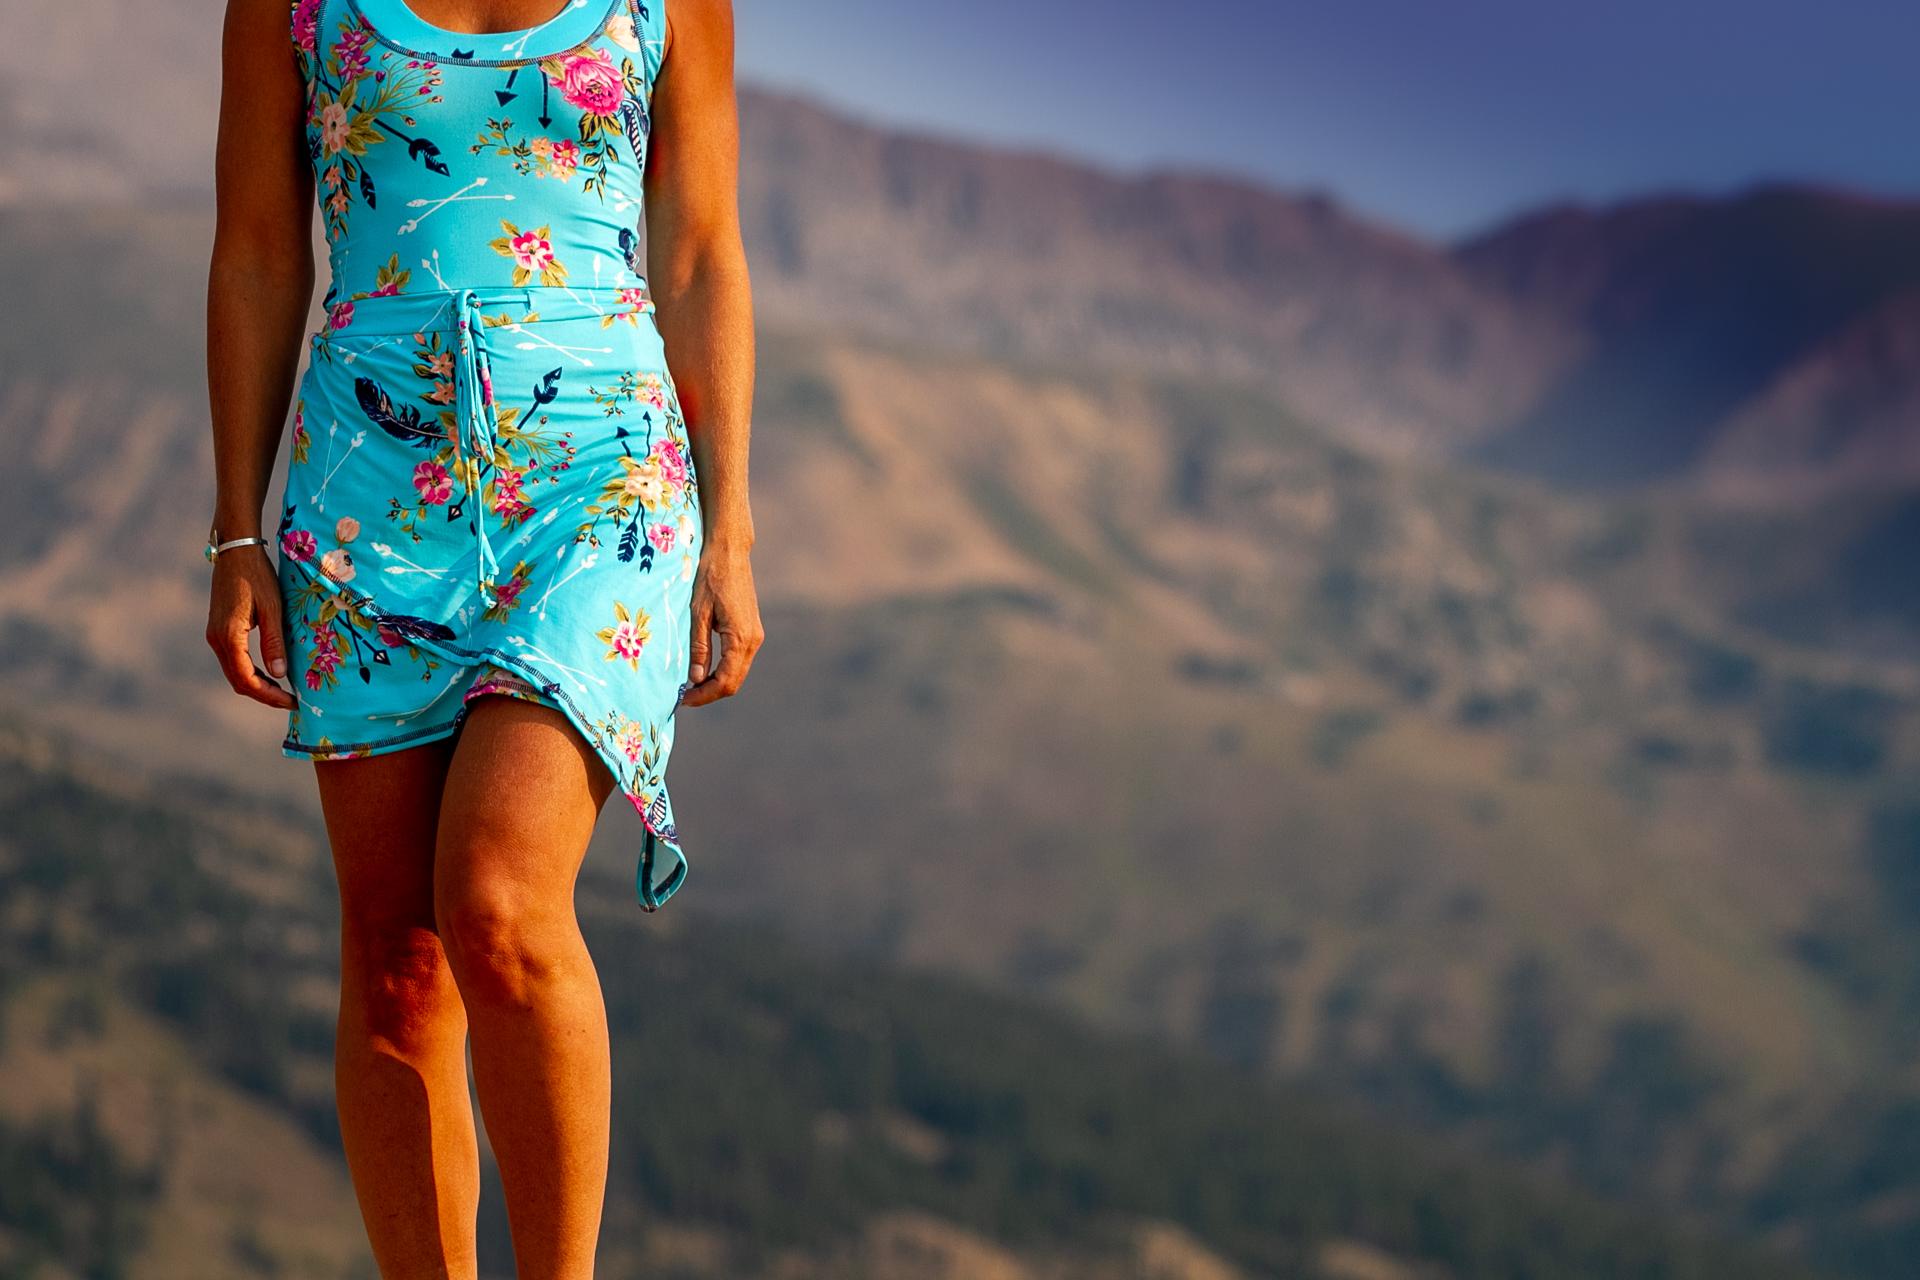 Fashion Design Autumn Warner wearing a cute tennis dress with pockets